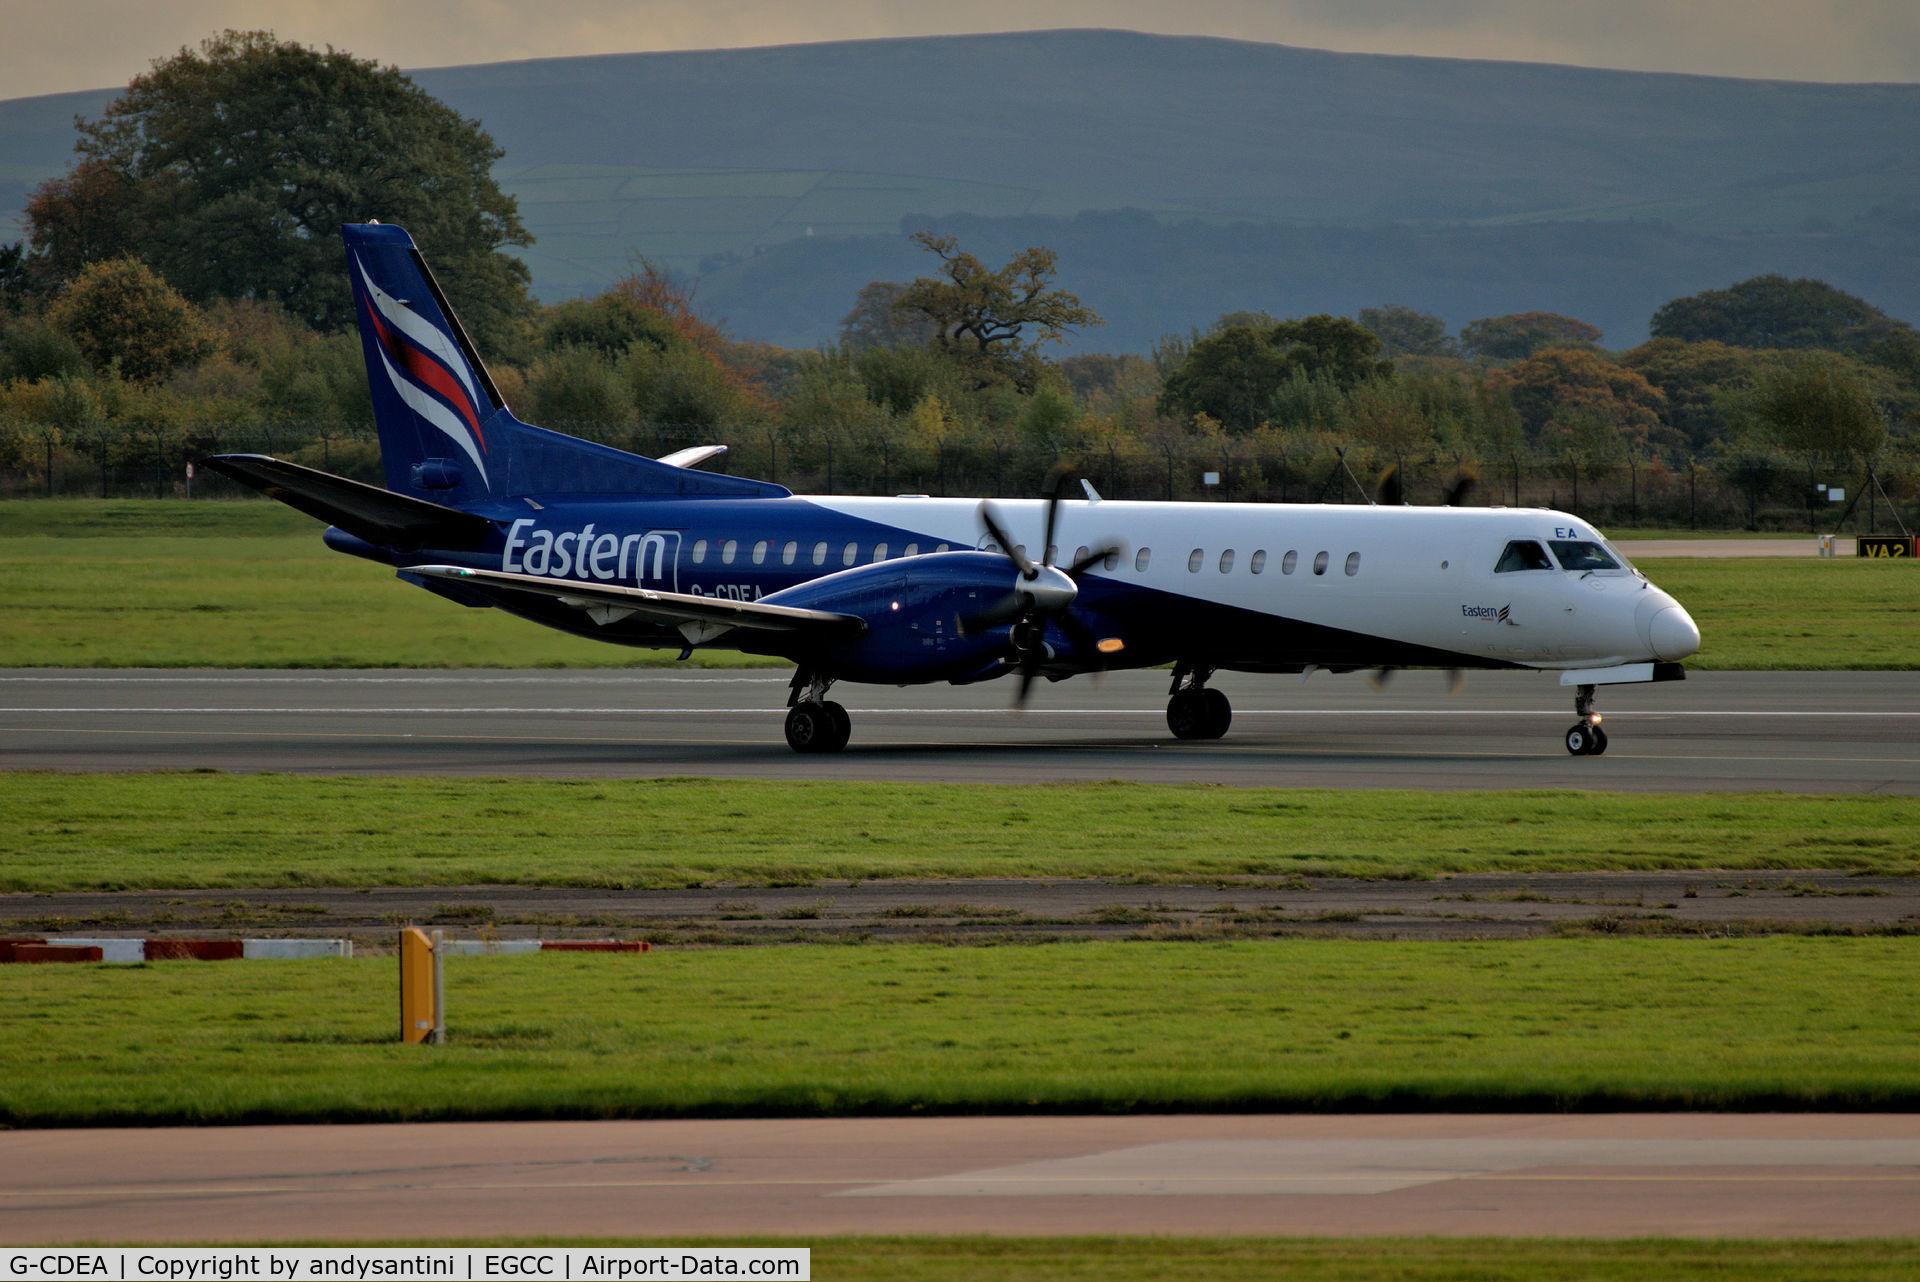 G-CDEA, 1994 Saab 2000 C/N 2000-009, just landed on runway [23R]